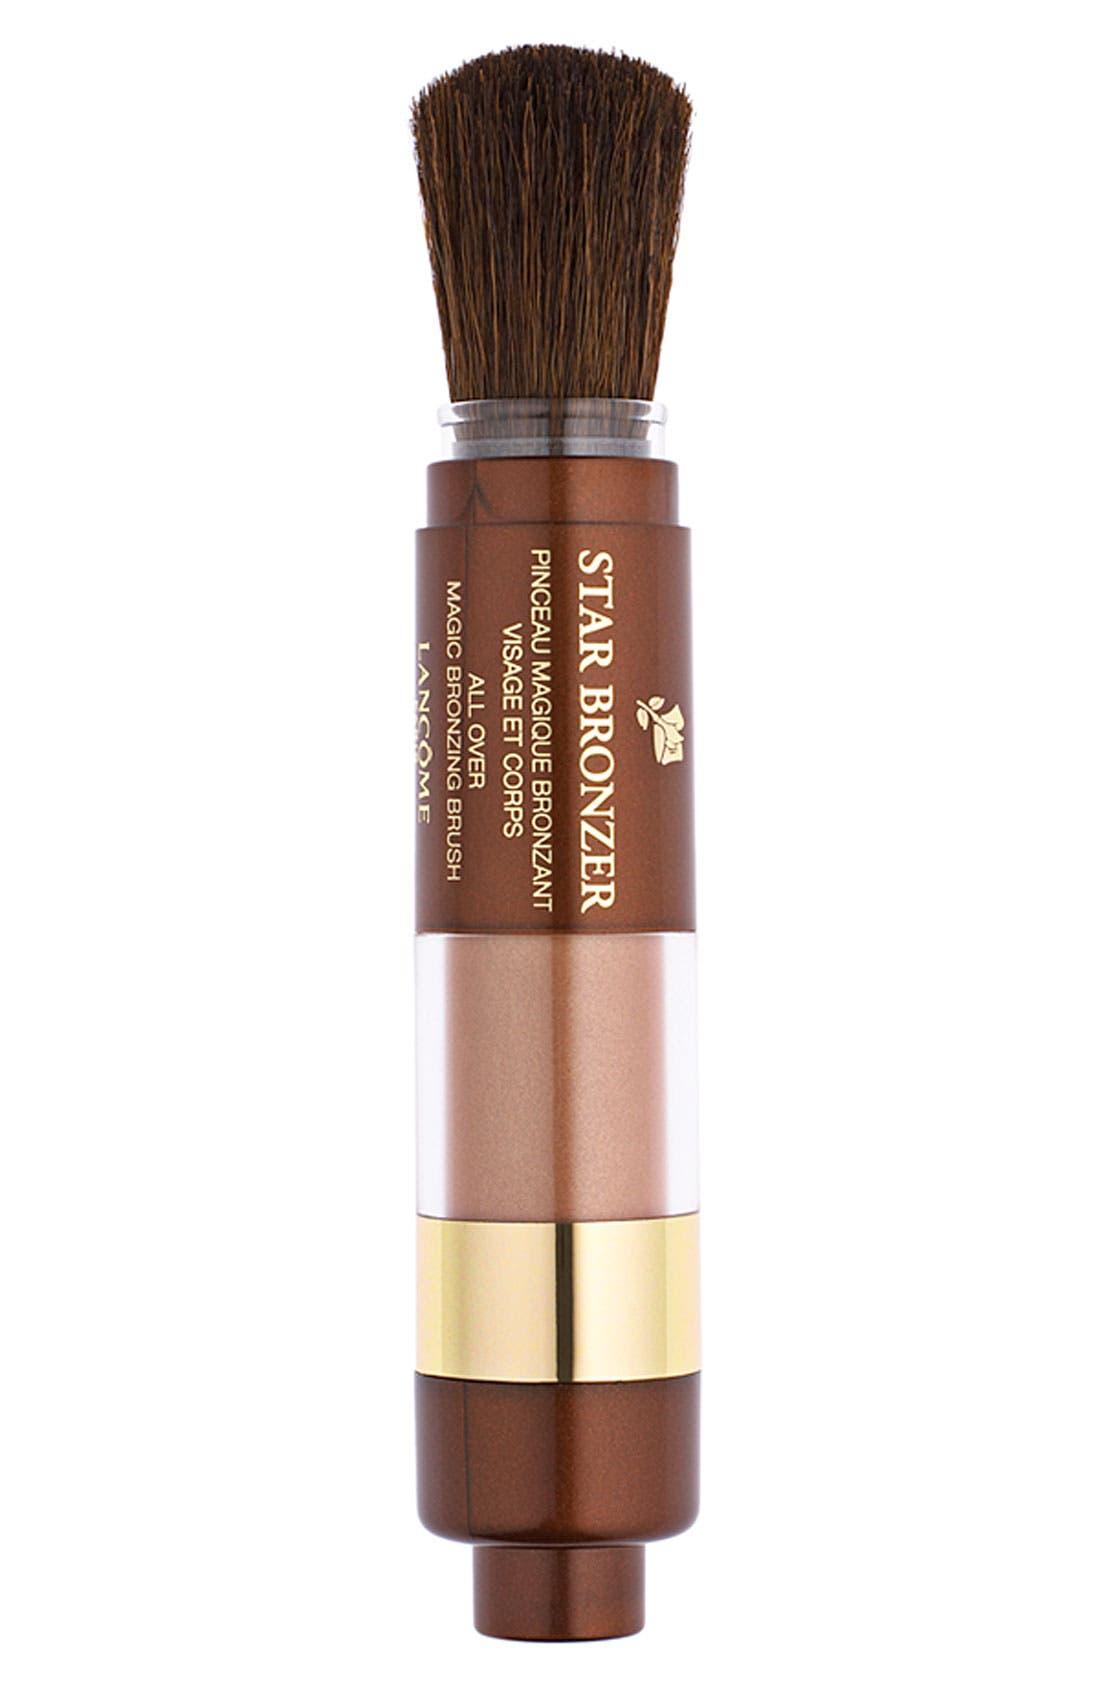 Lancôme Star Bronzer Magic Bronzing Brush